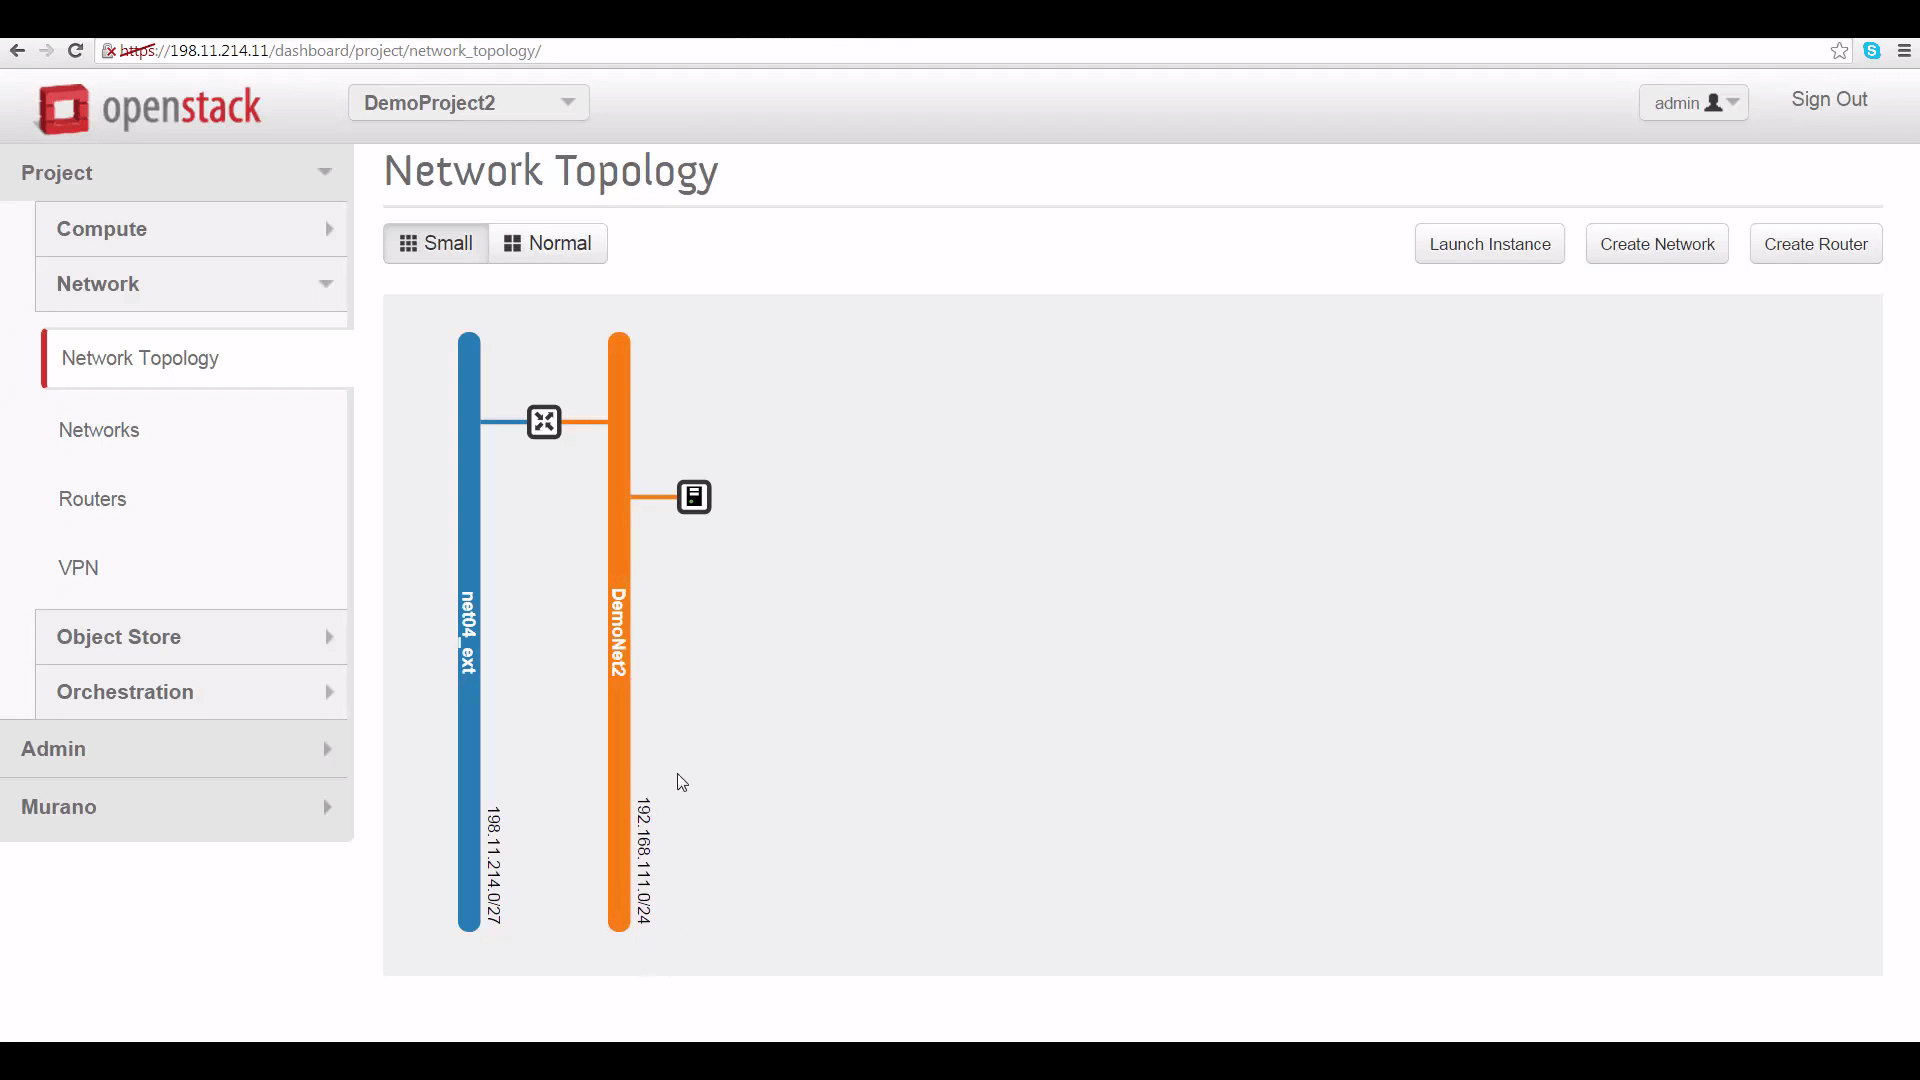 screenshot of DemoProject2's network topology on Cloud B